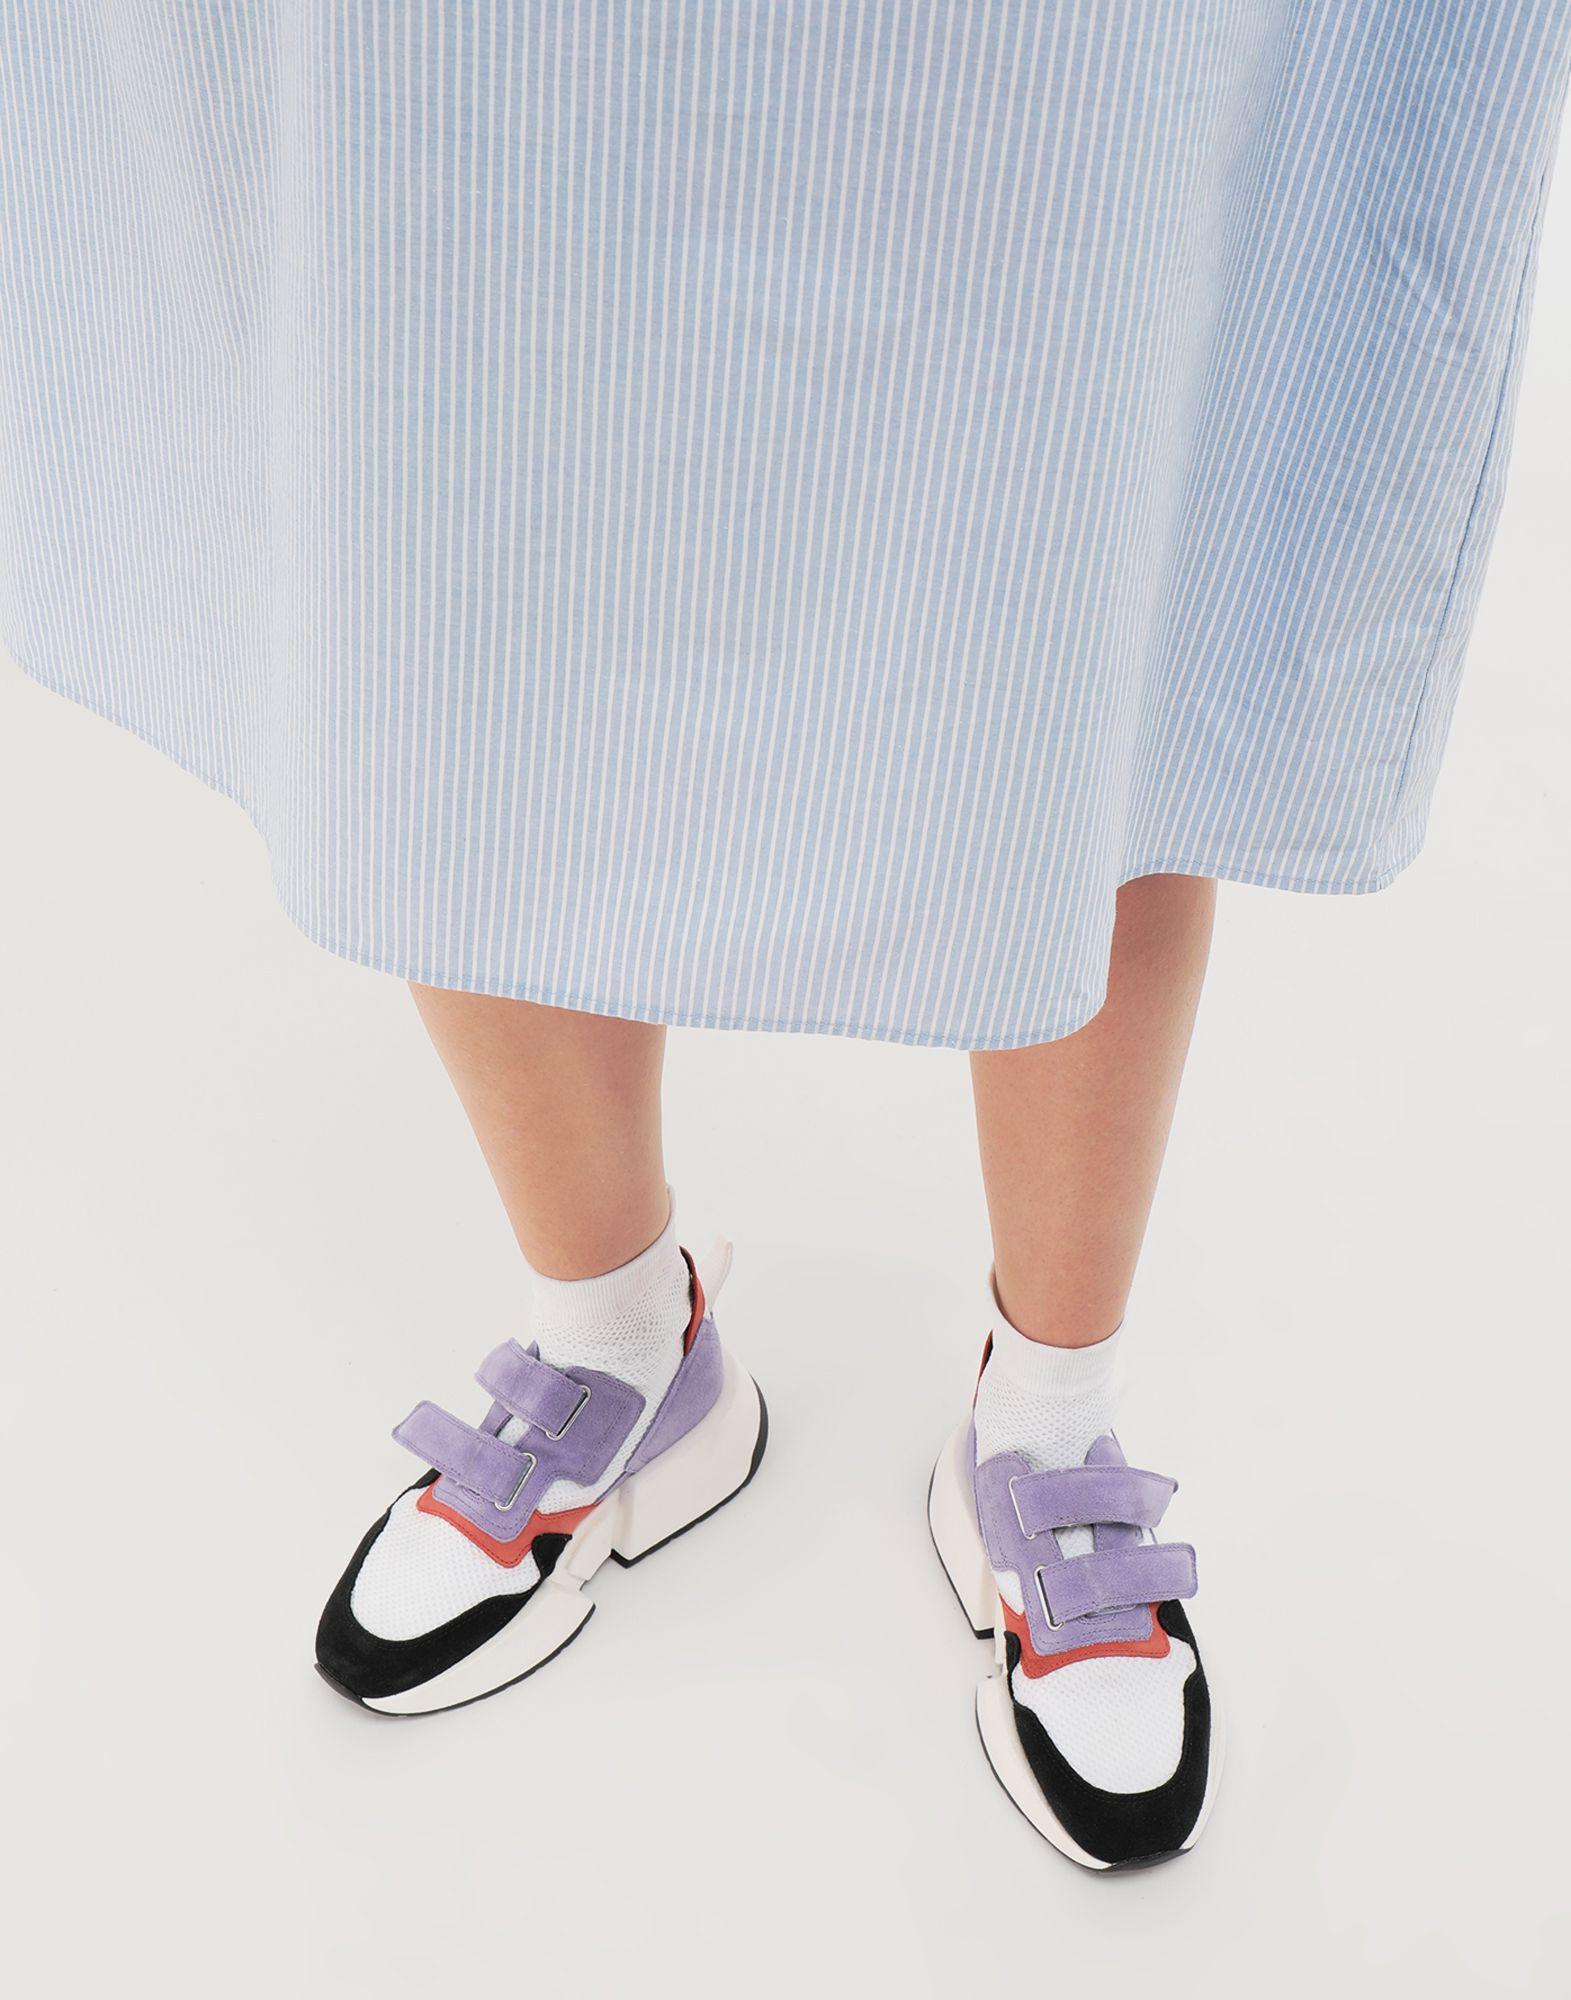 MM6 MAISON MARGIELA Sock runner leather sneakers Sneakers Woman b